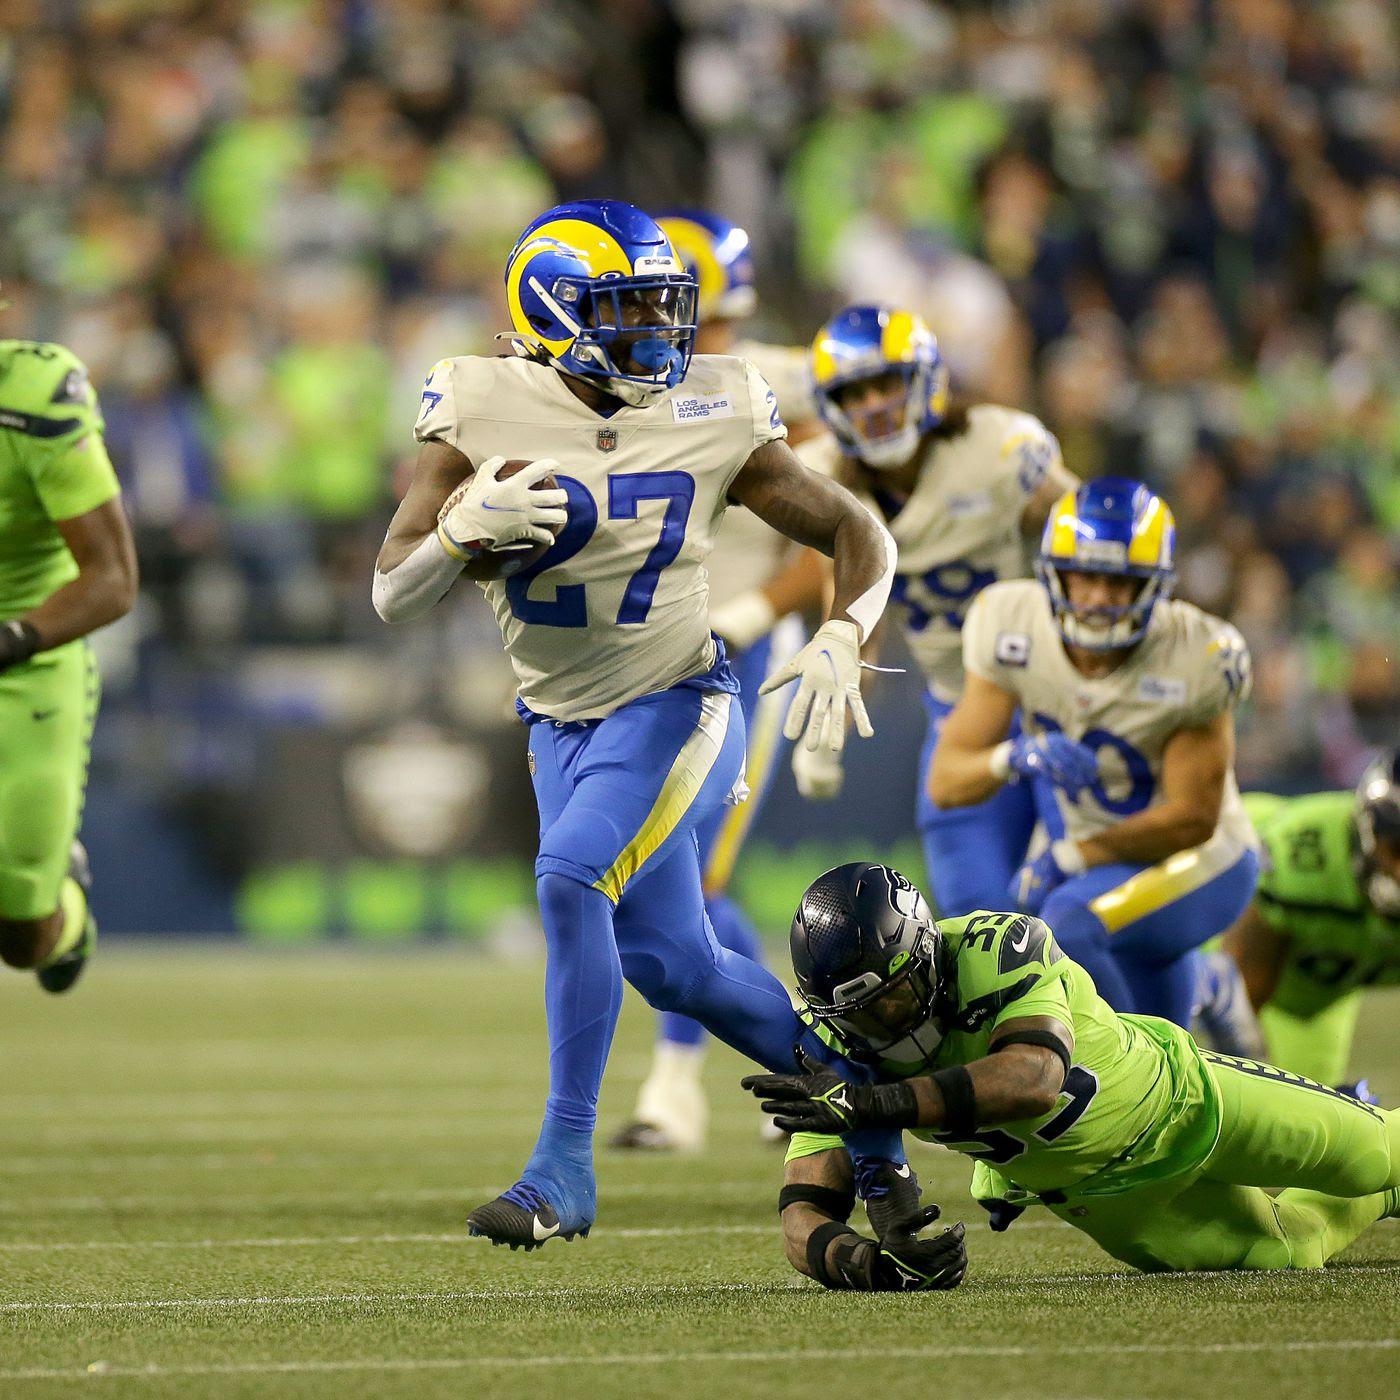 Seattle Seahawks defense struggles under KNJ in spite of investments